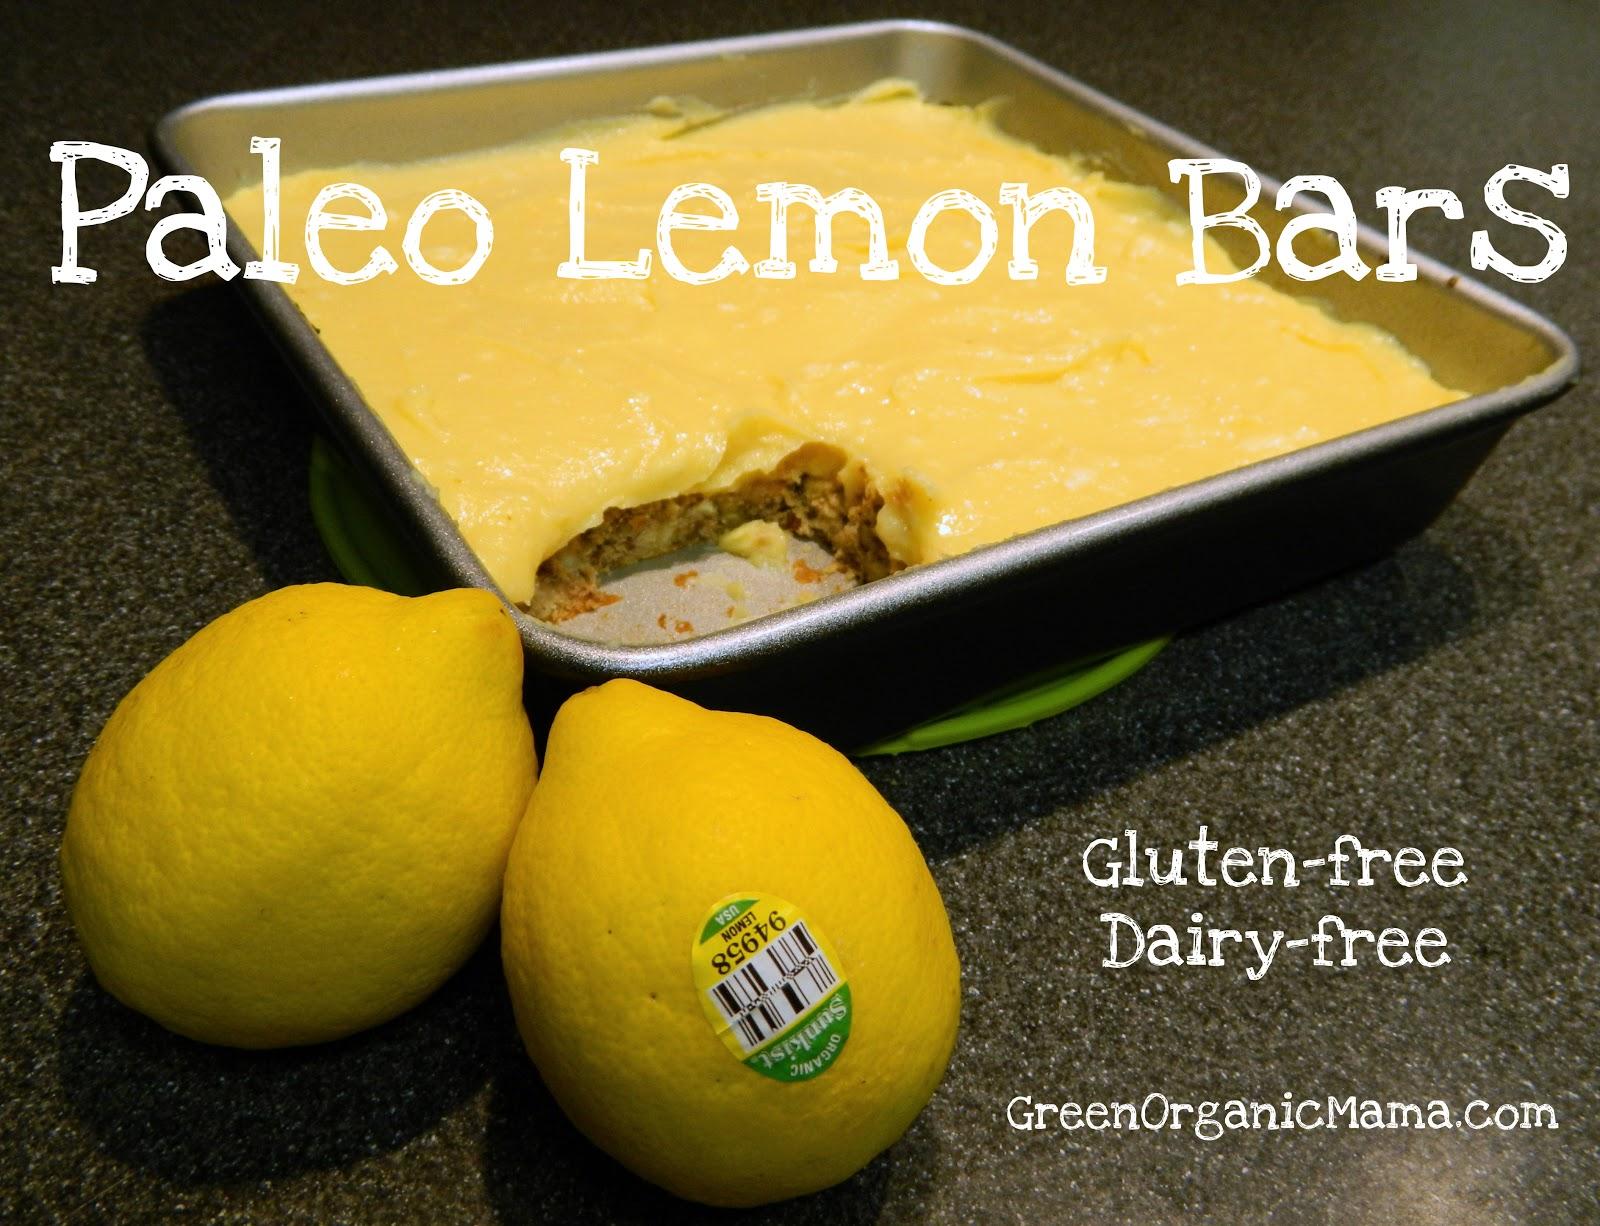 Paleo lemon bars gluten-free dairy-free